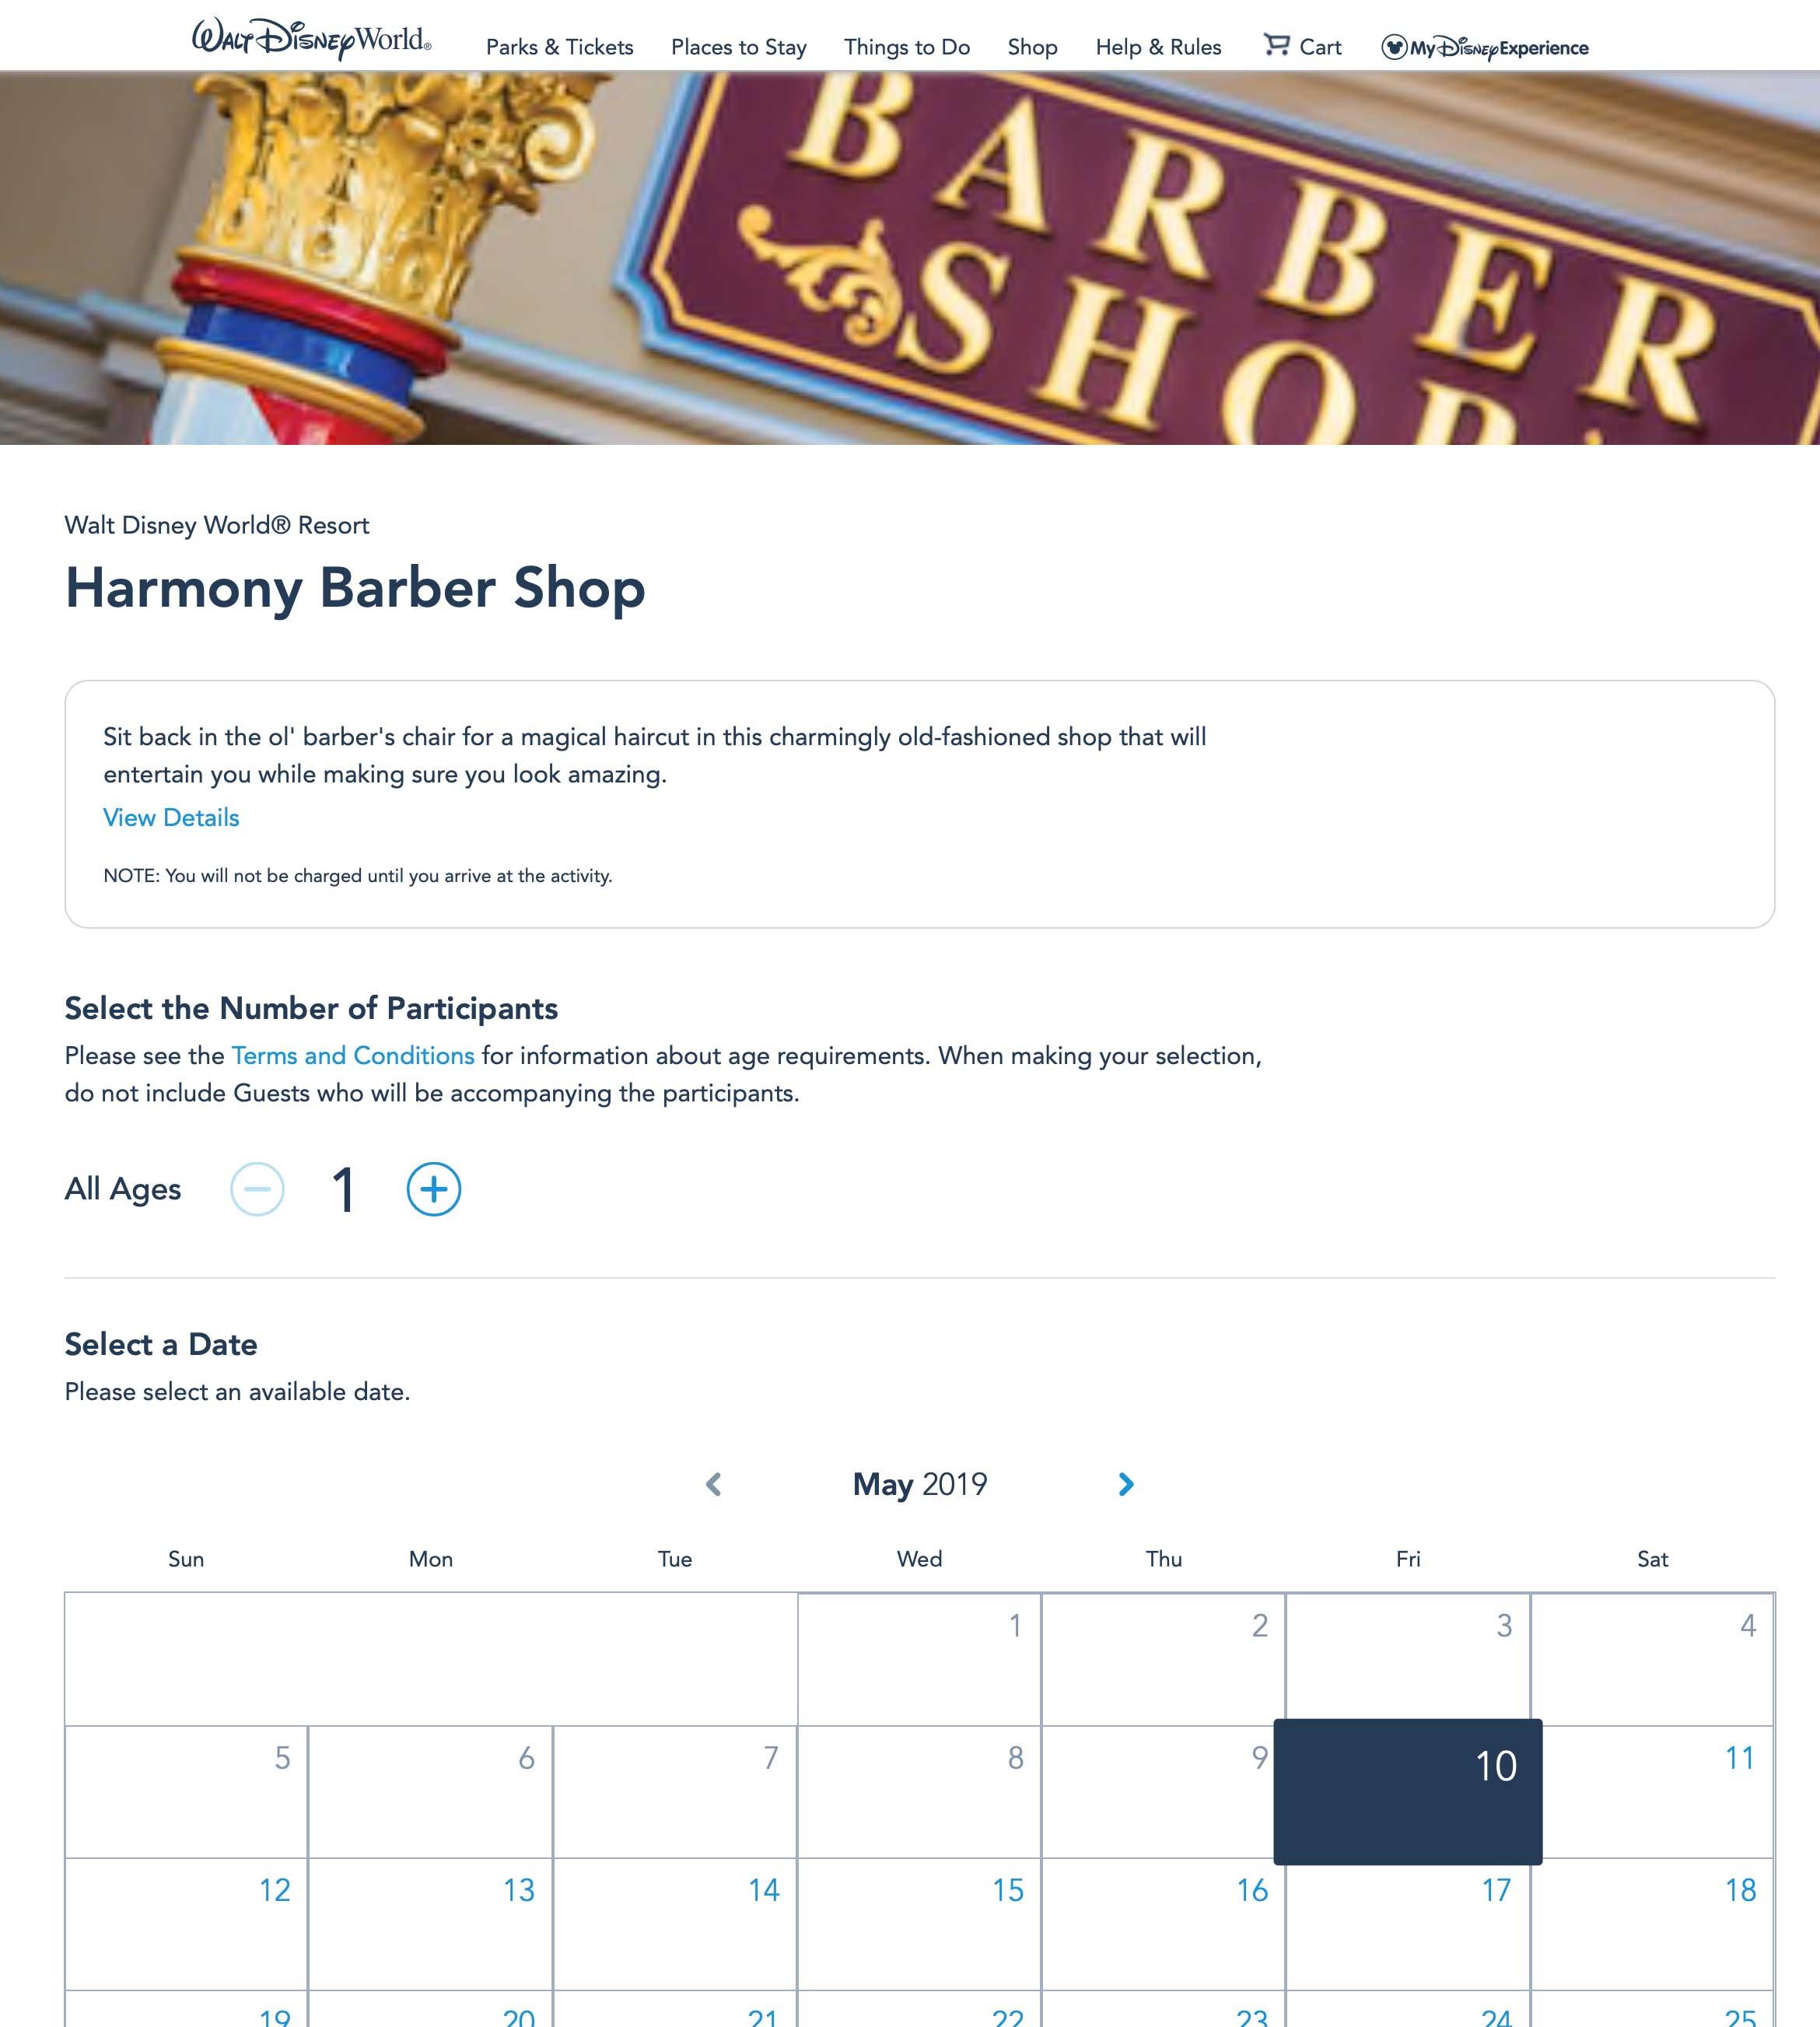 Online reservations for Harmony Barber Shop